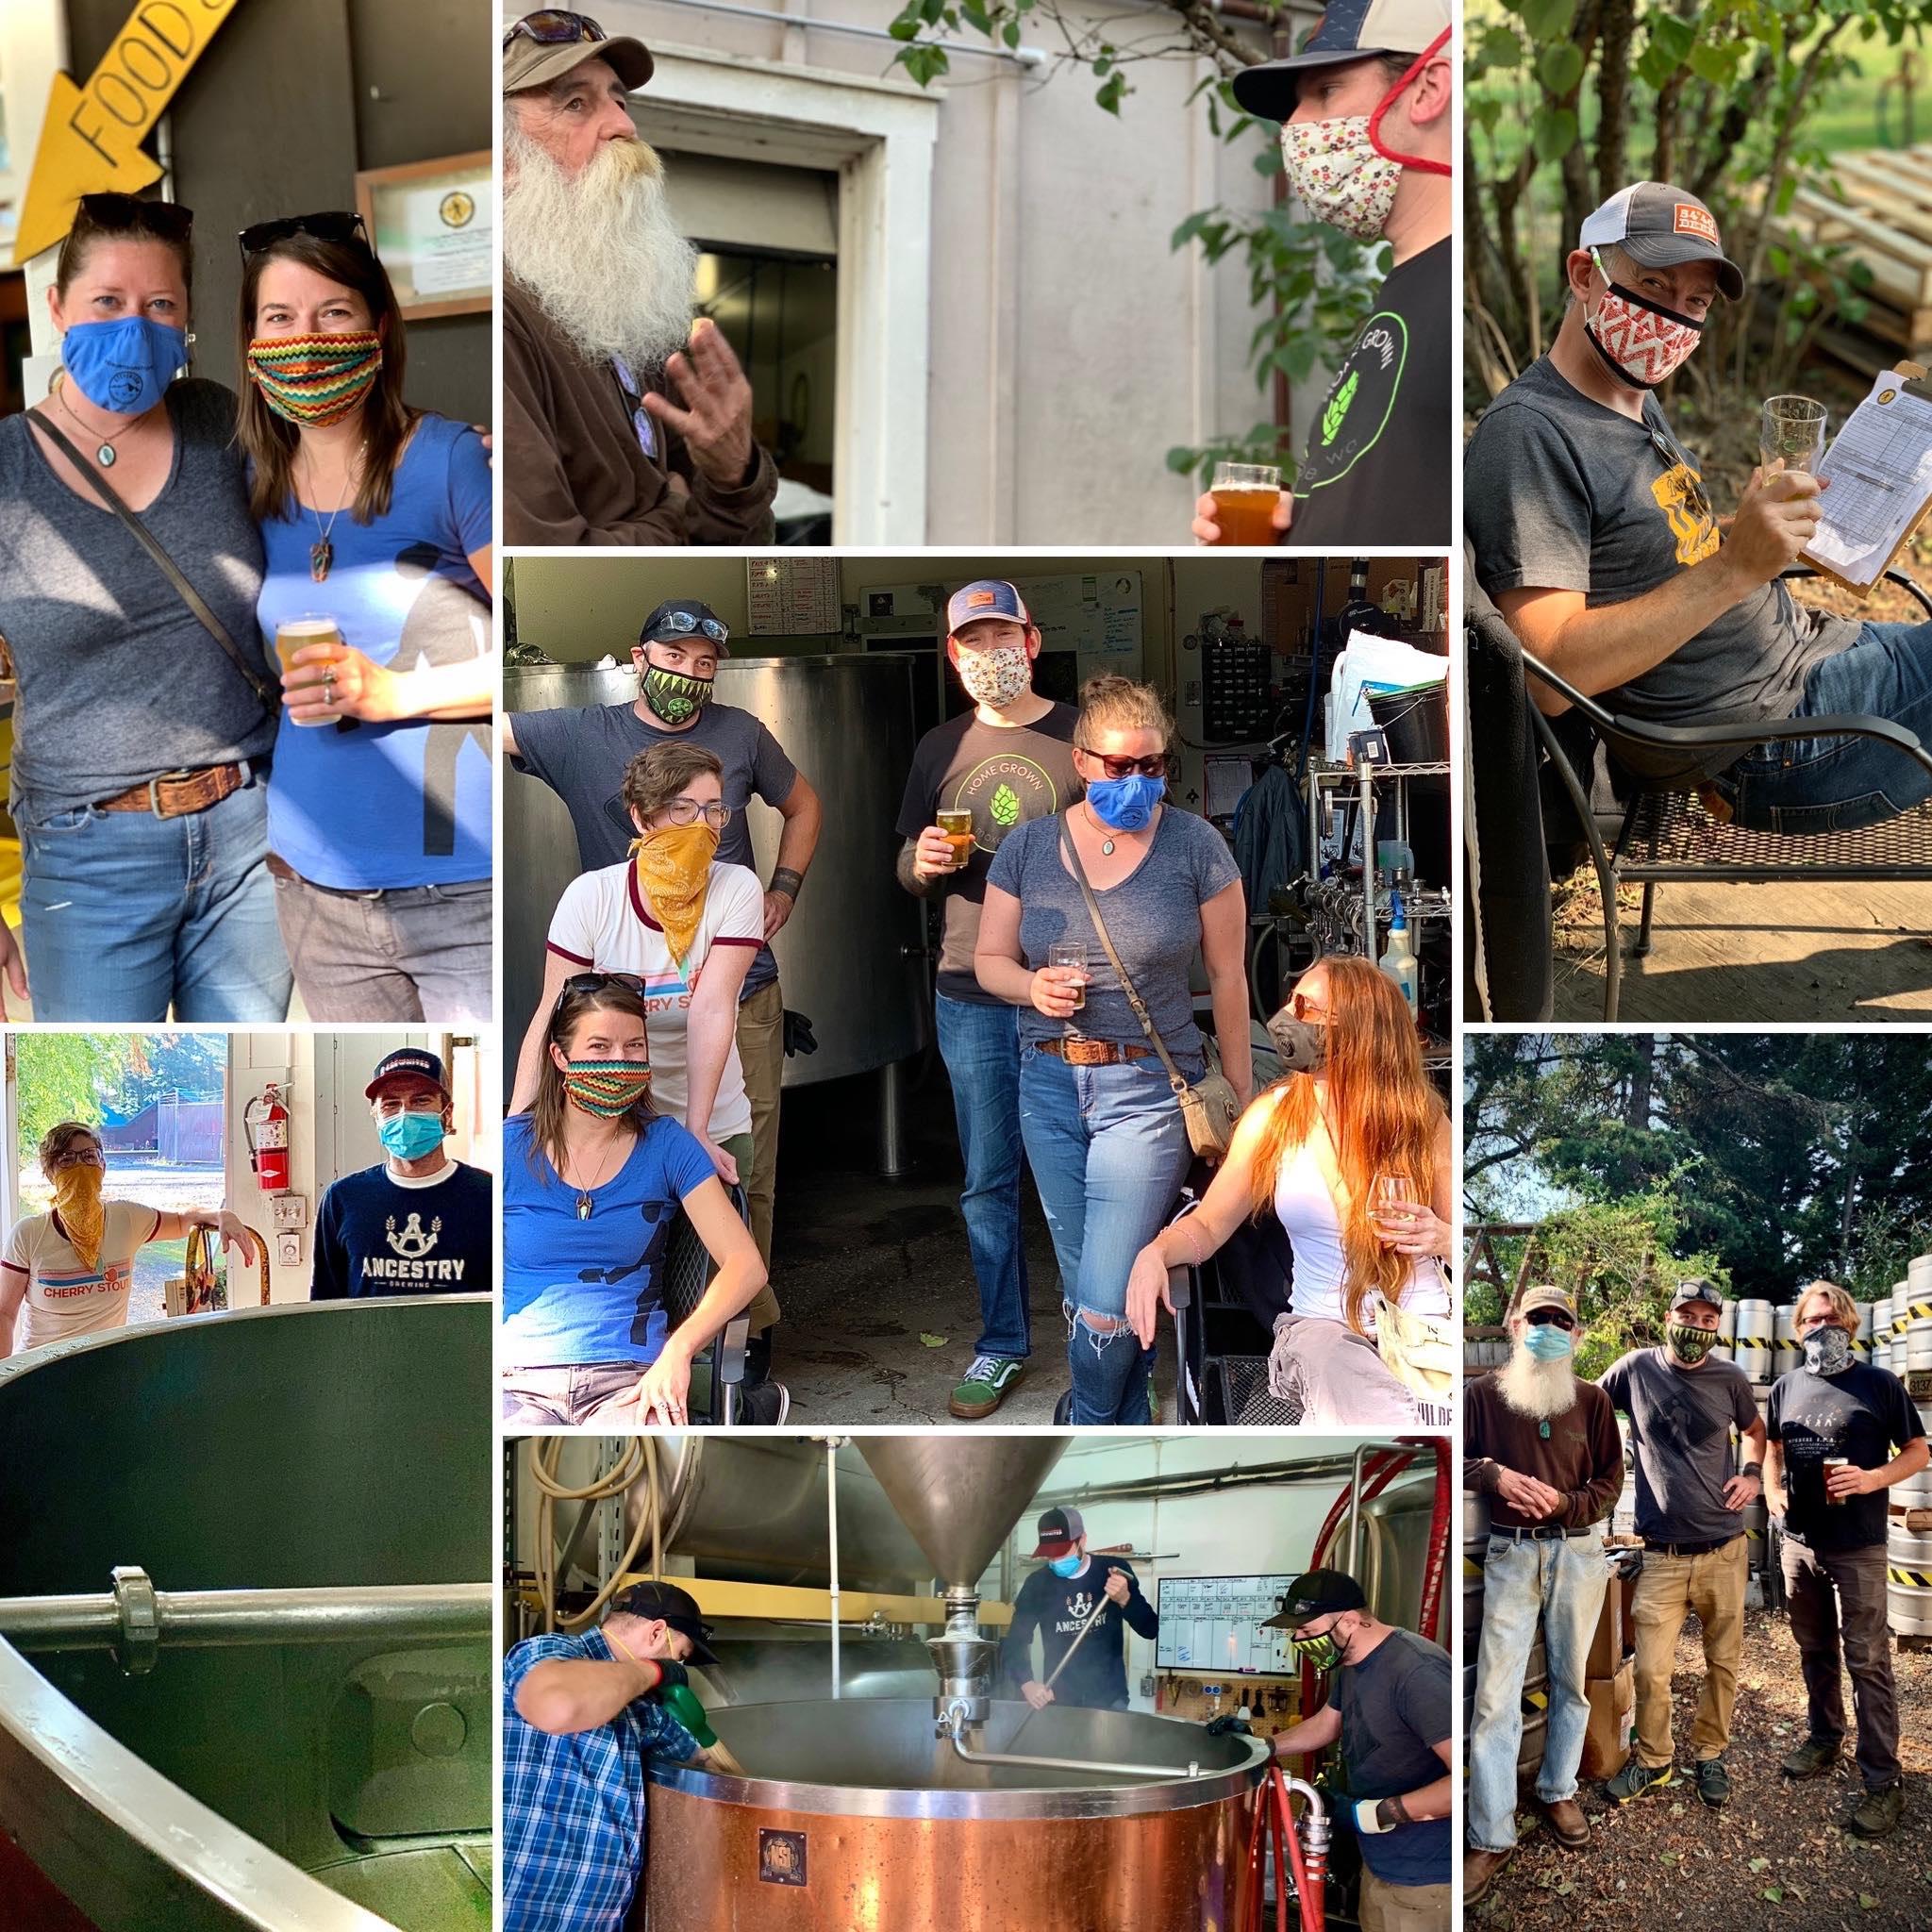 Walking Man Brewing Anniversary collaboration collage. (image courtesy of Walking Man Brewing)